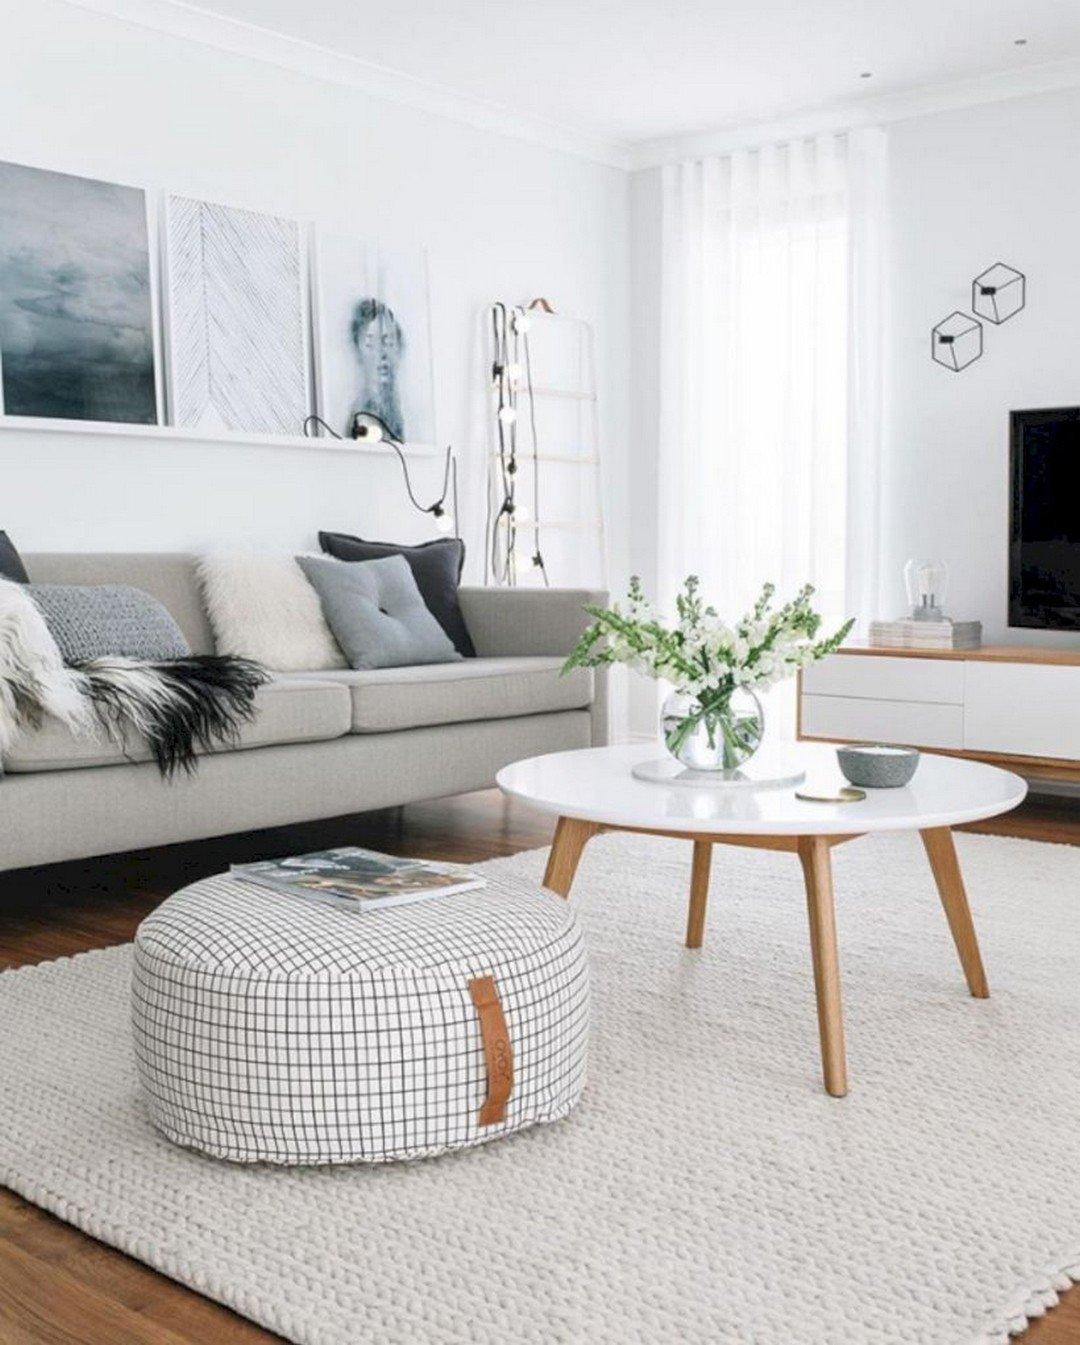 Cozy Small Living Room Ideas 15 Perfect and Cozy Small Living Room Design De Agz